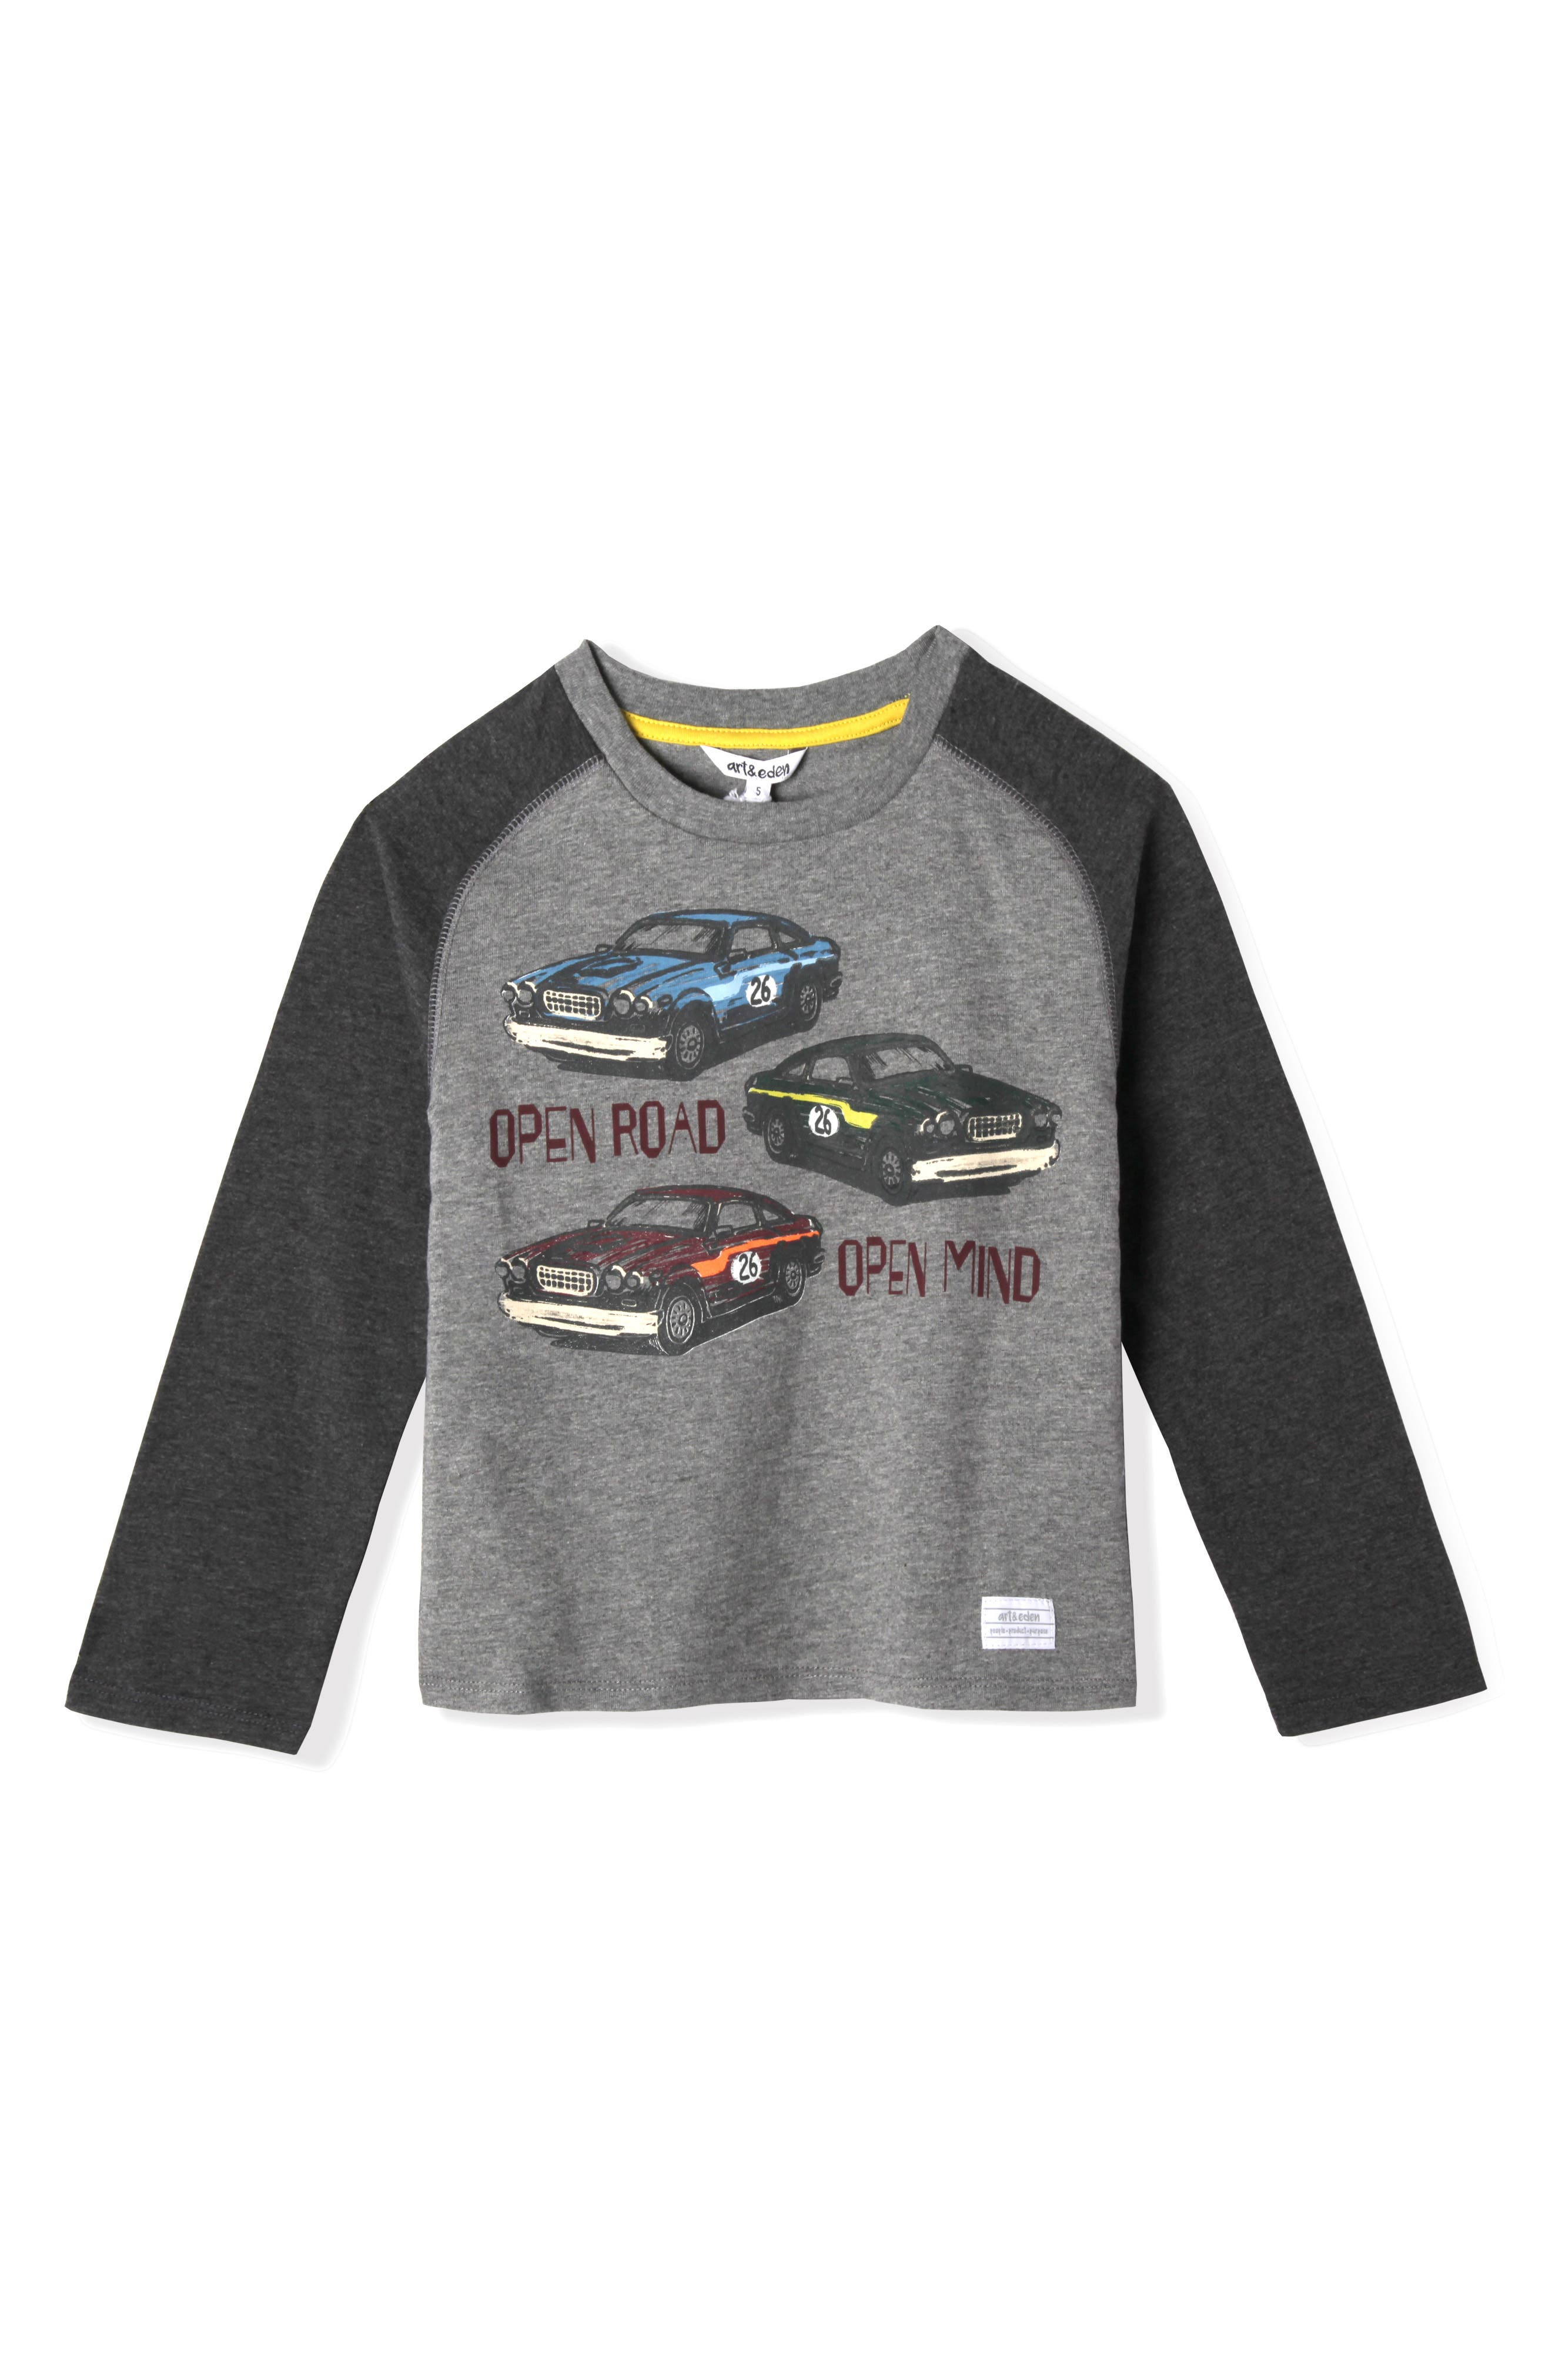 Open Road Organic Cotton T-Shirt,                         Main,                         color, Grey Heather